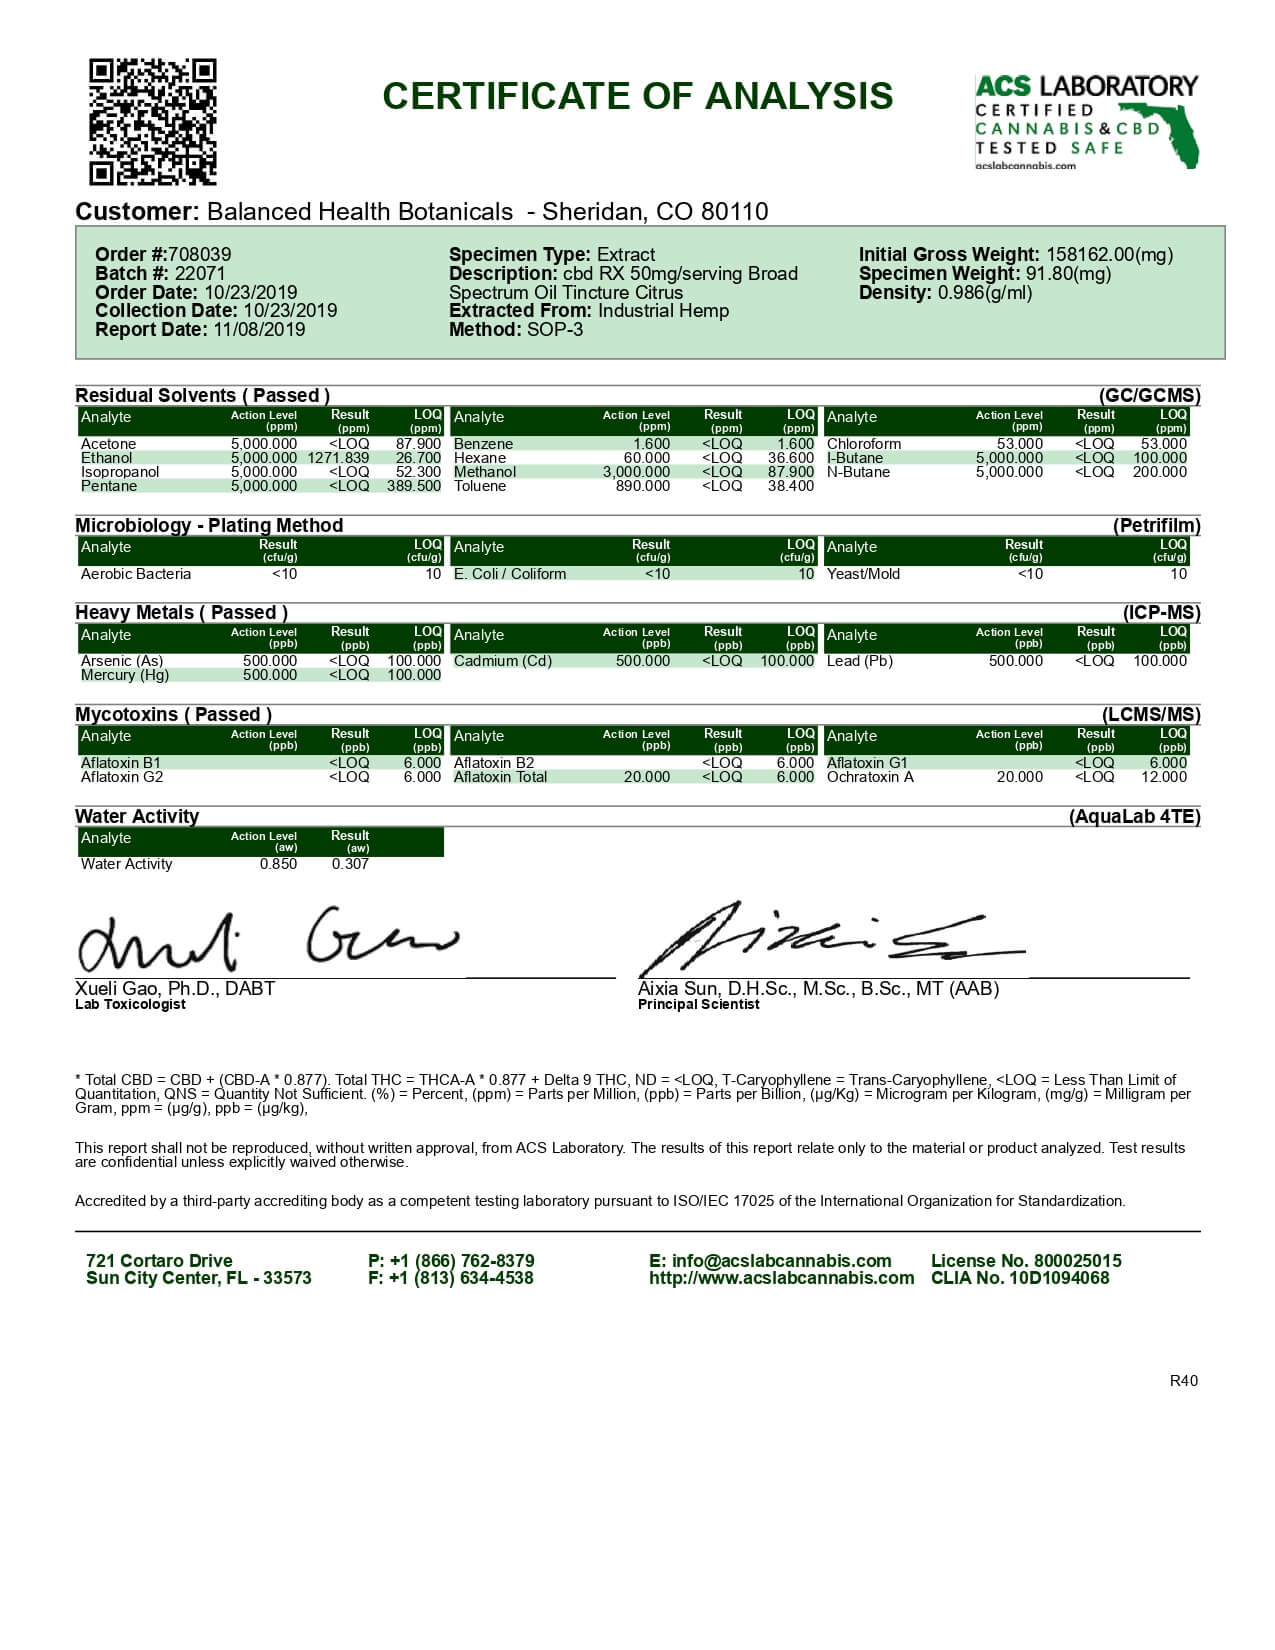 CBDistillery Rx CBD Tincture Broad Spectrum Citrus 1500mg Lab Report